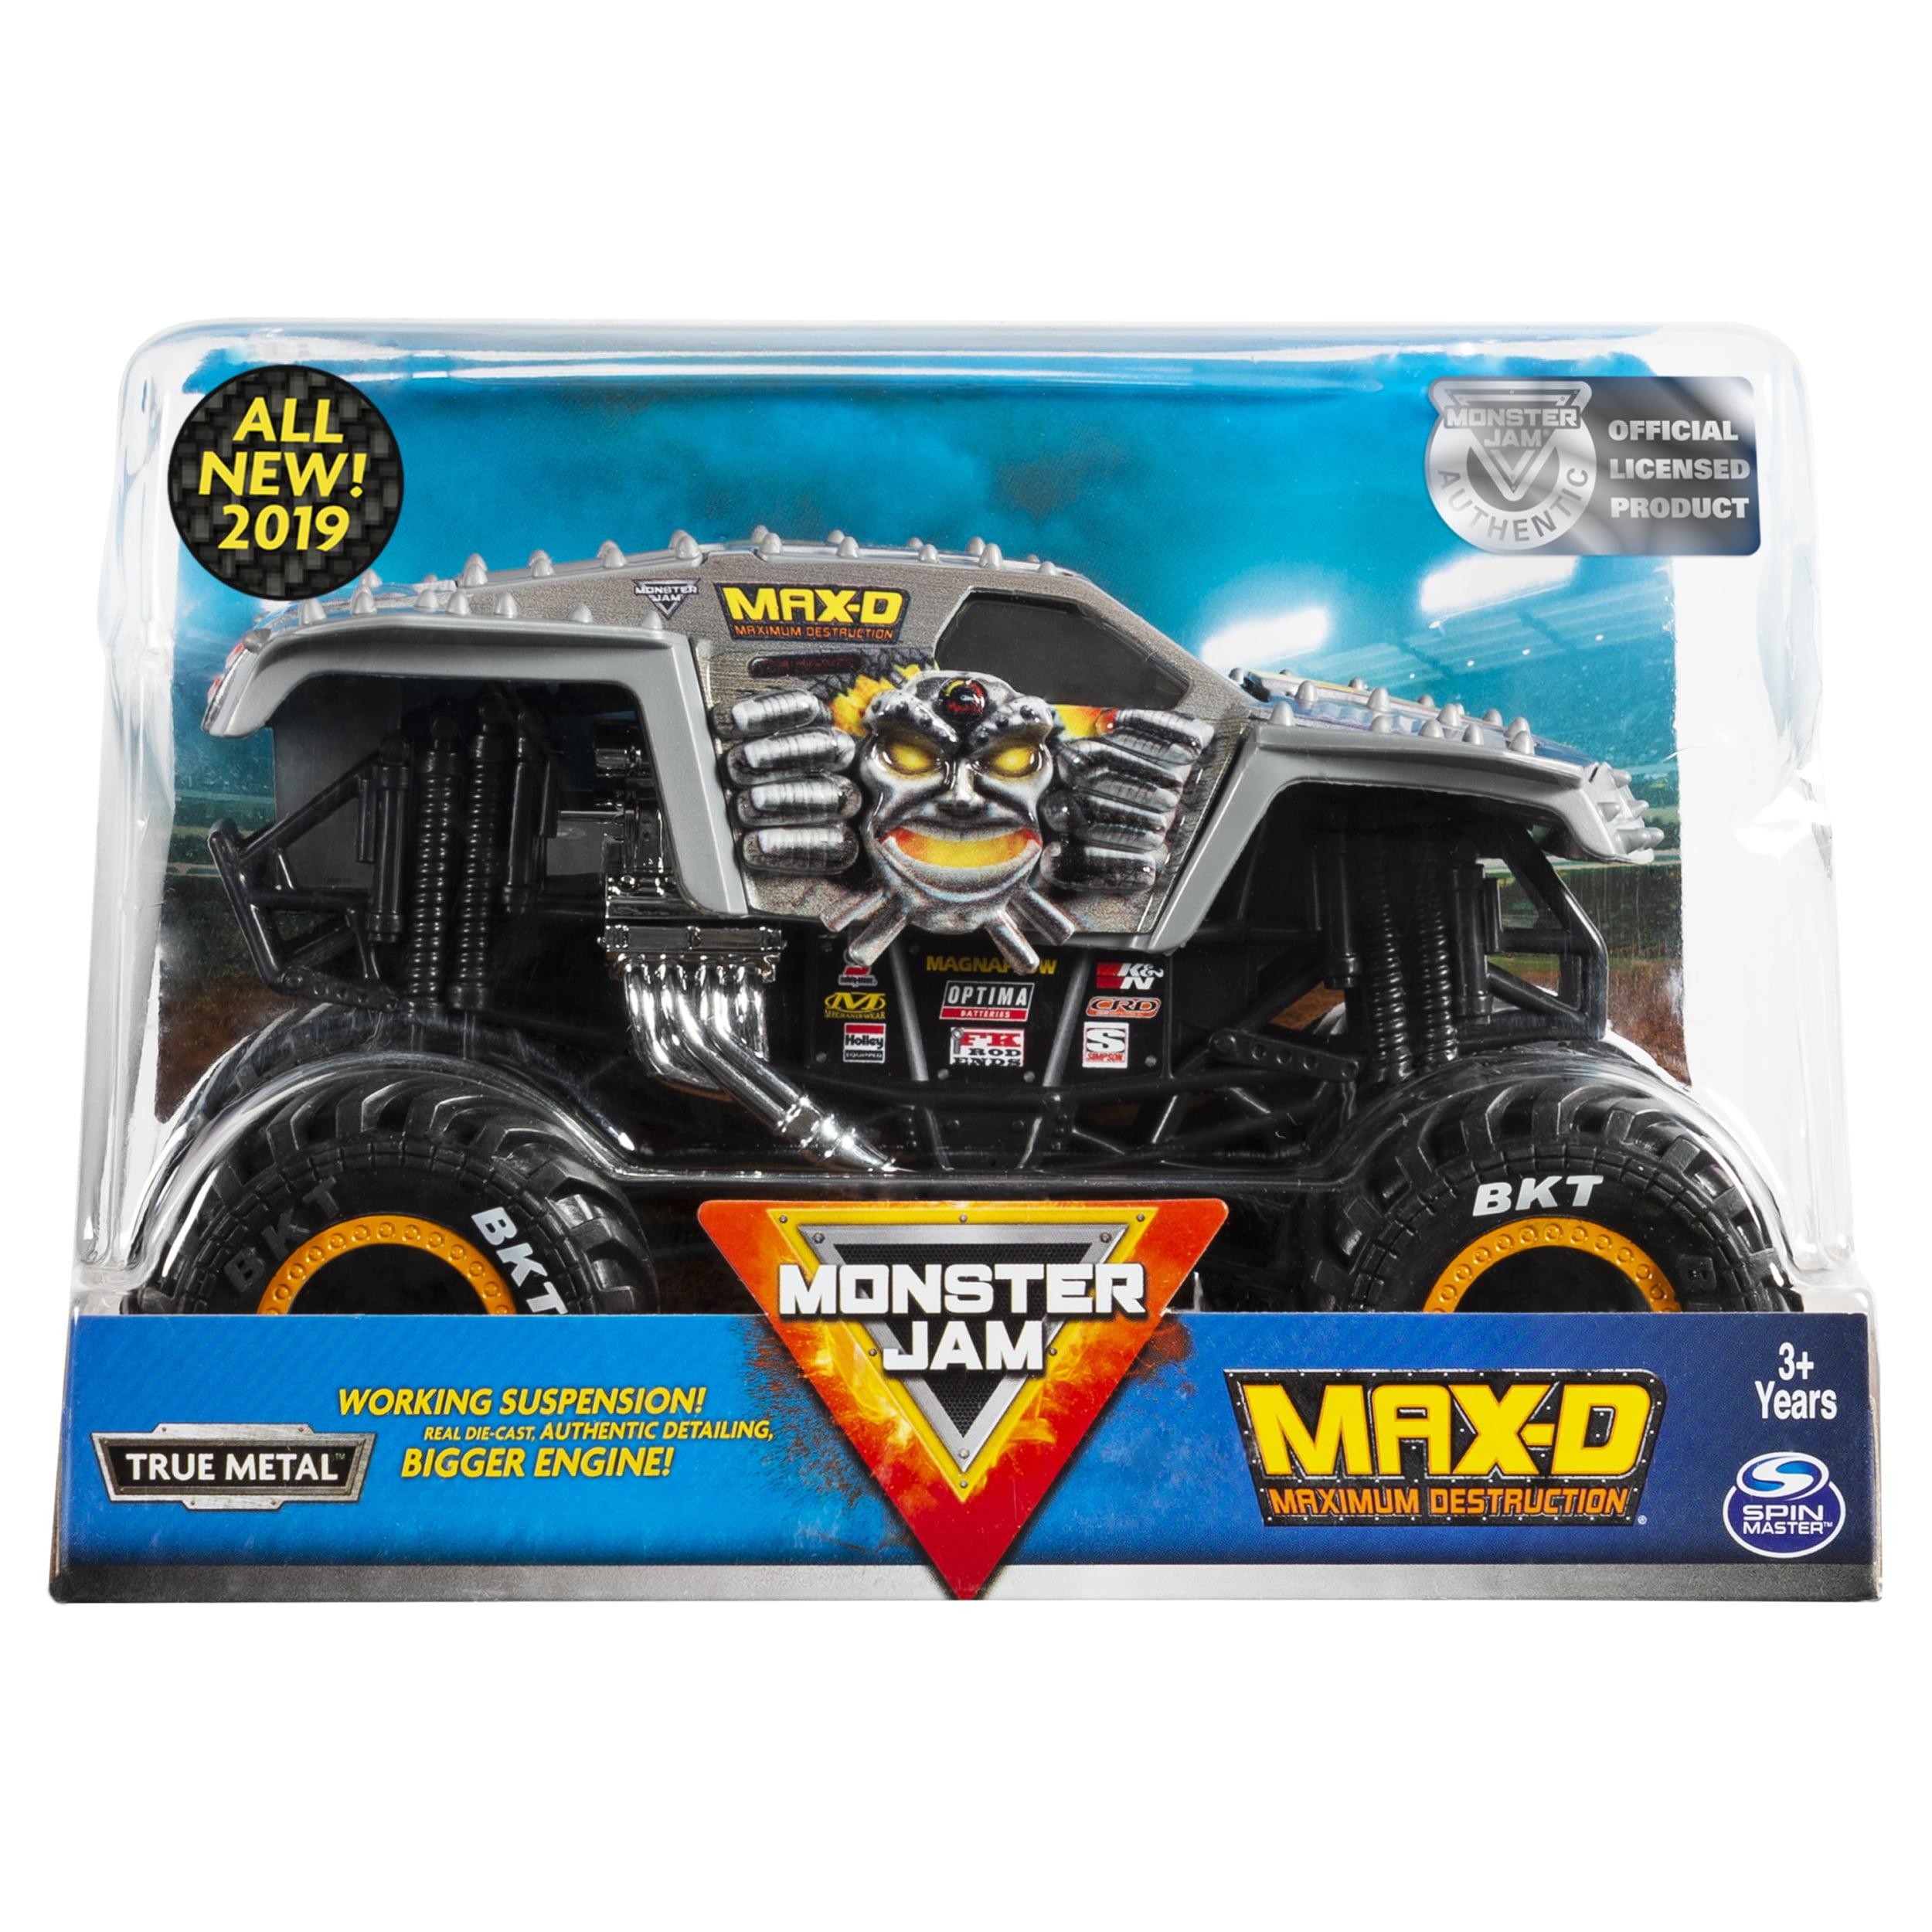 Monster Jam Official Max D Monster Truck Die Cast Vehicle 1 24 Scale Walmart Com Walmart Com